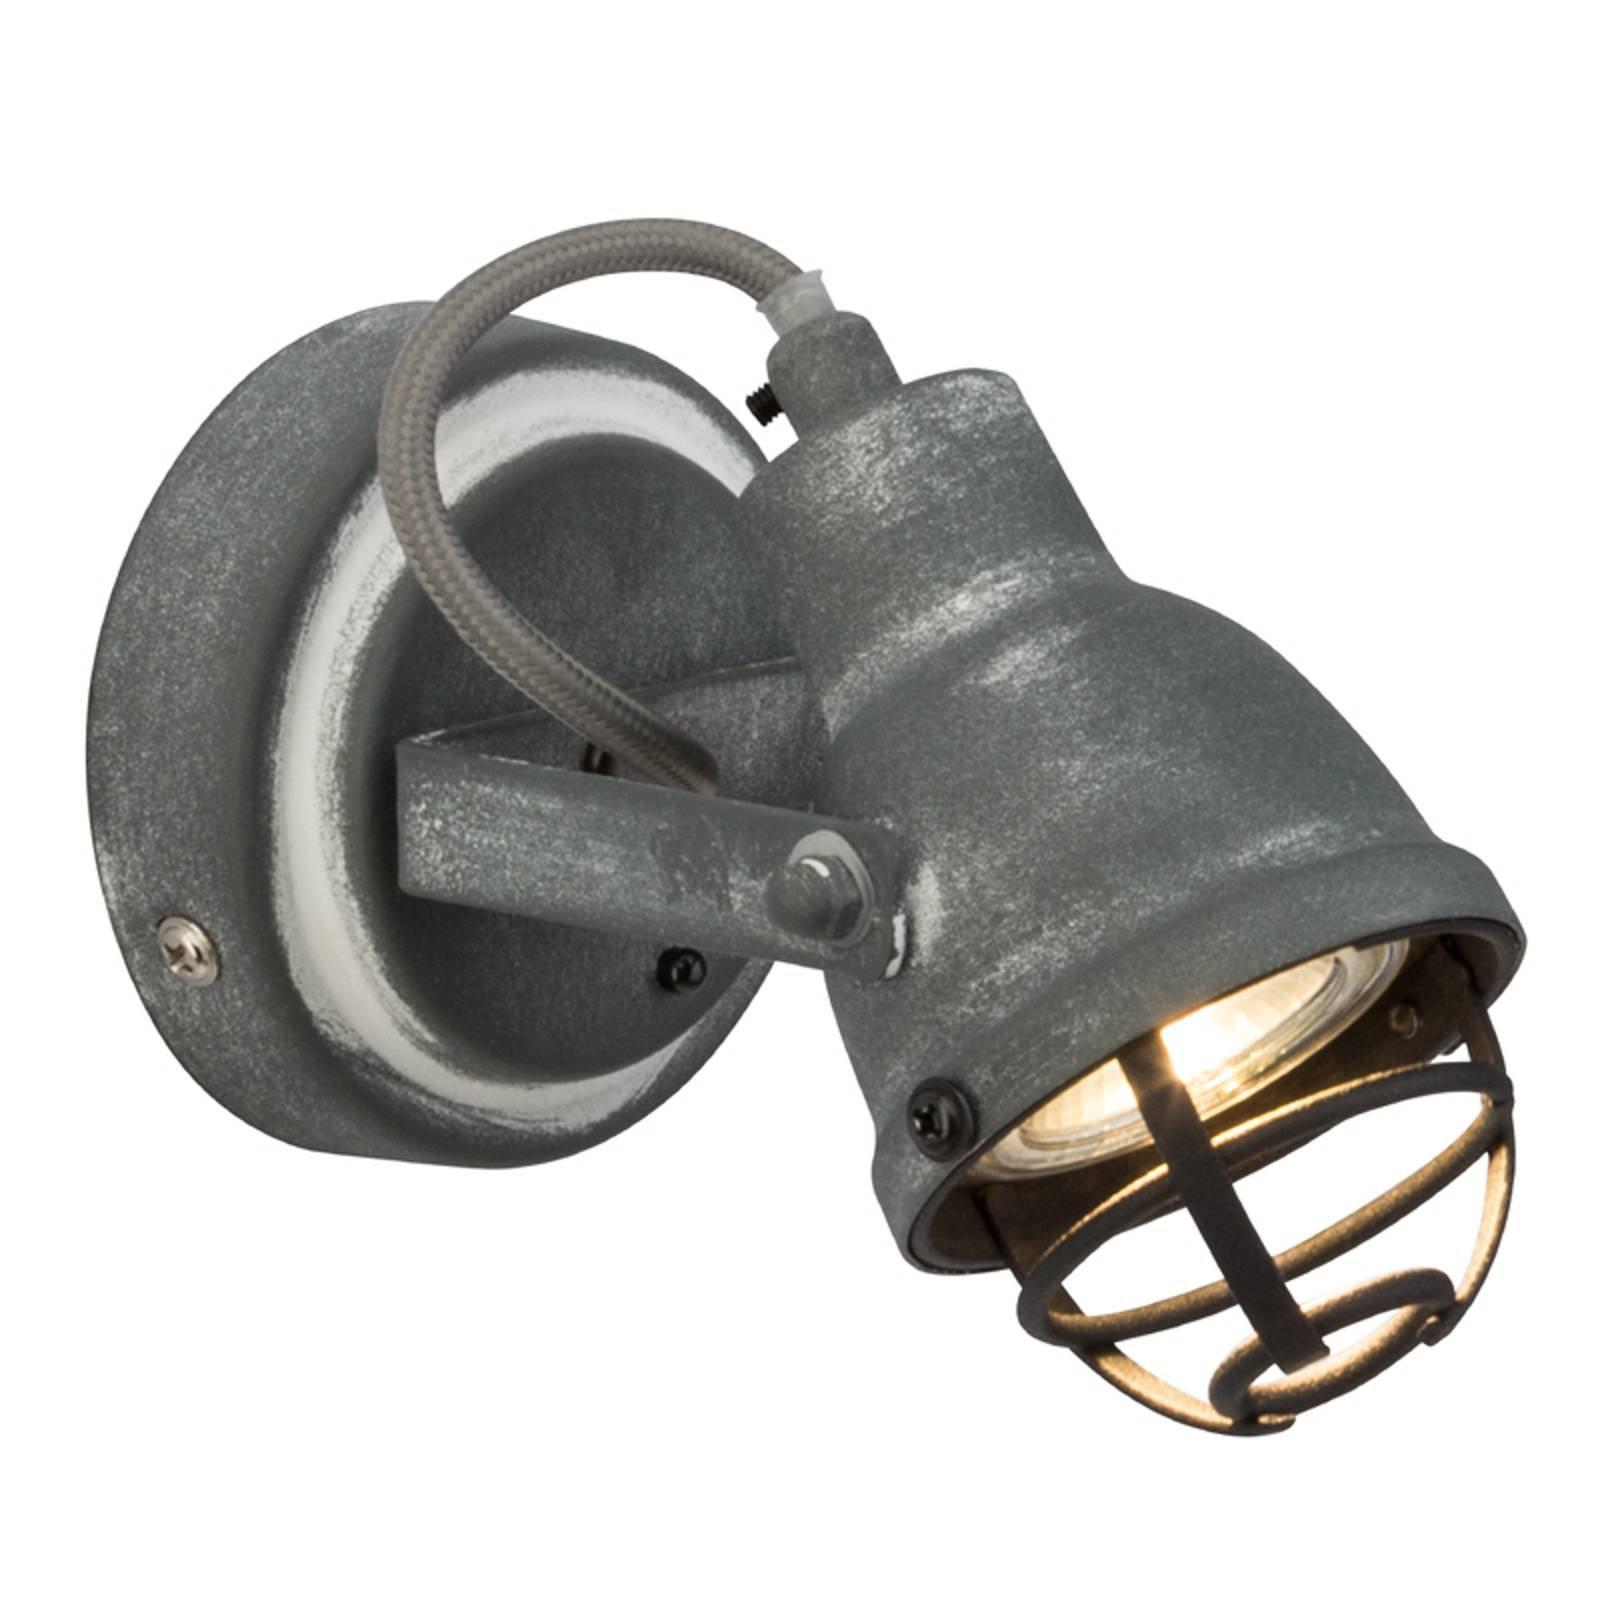 I trendy industri-look LED vegglampe Bente